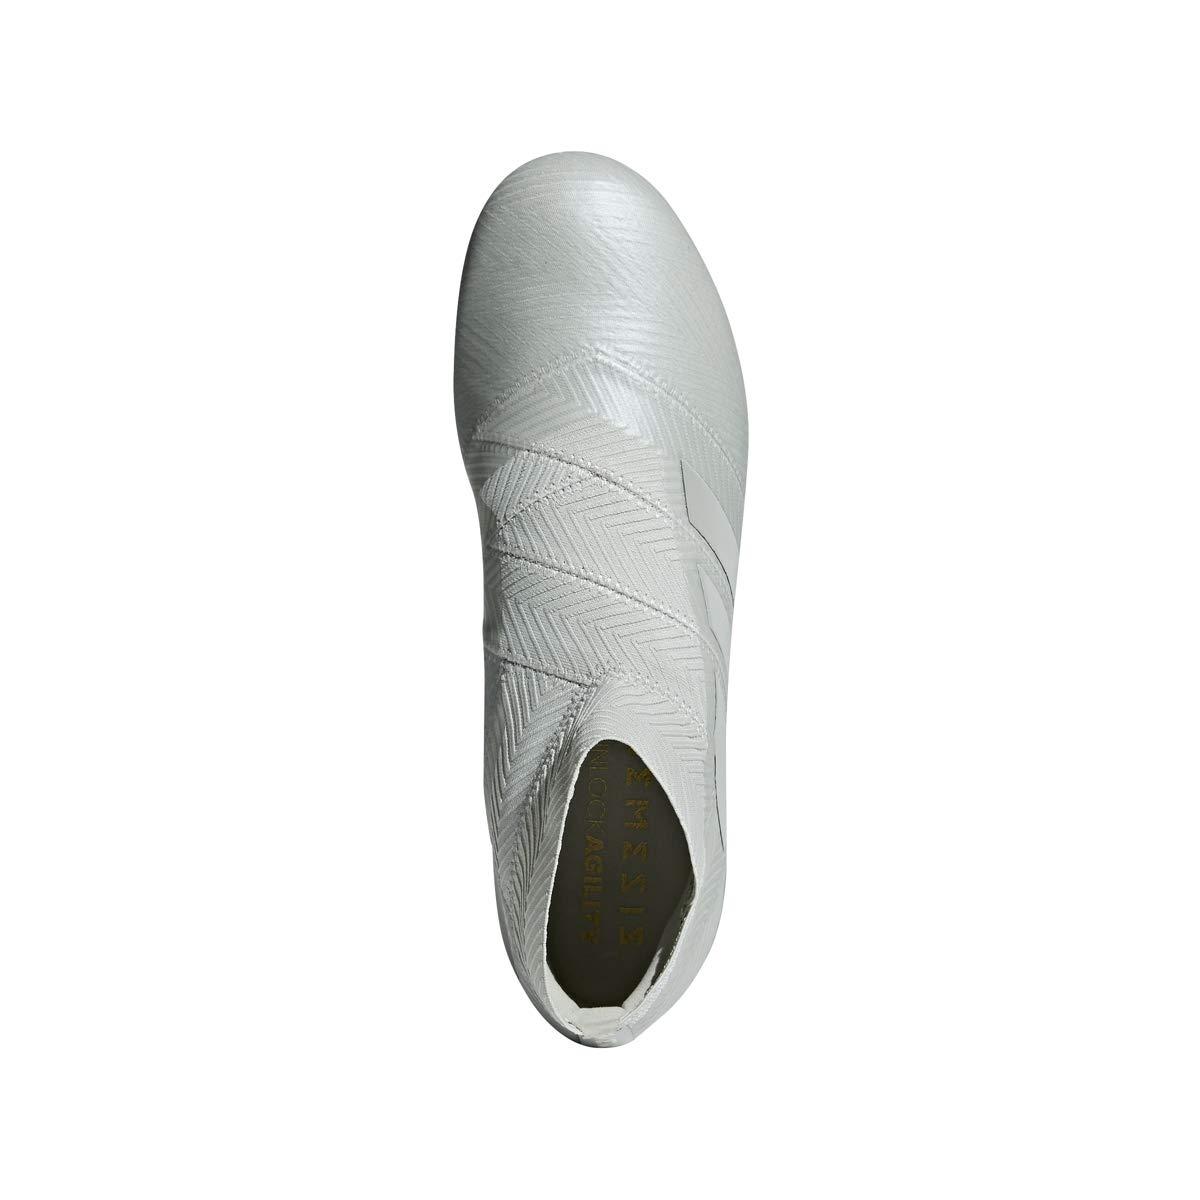 huge discount 195b5 95ab0 Amazon.com  adidas Nemeziz 18+ FG Cleat - Mens Soccer  Socce